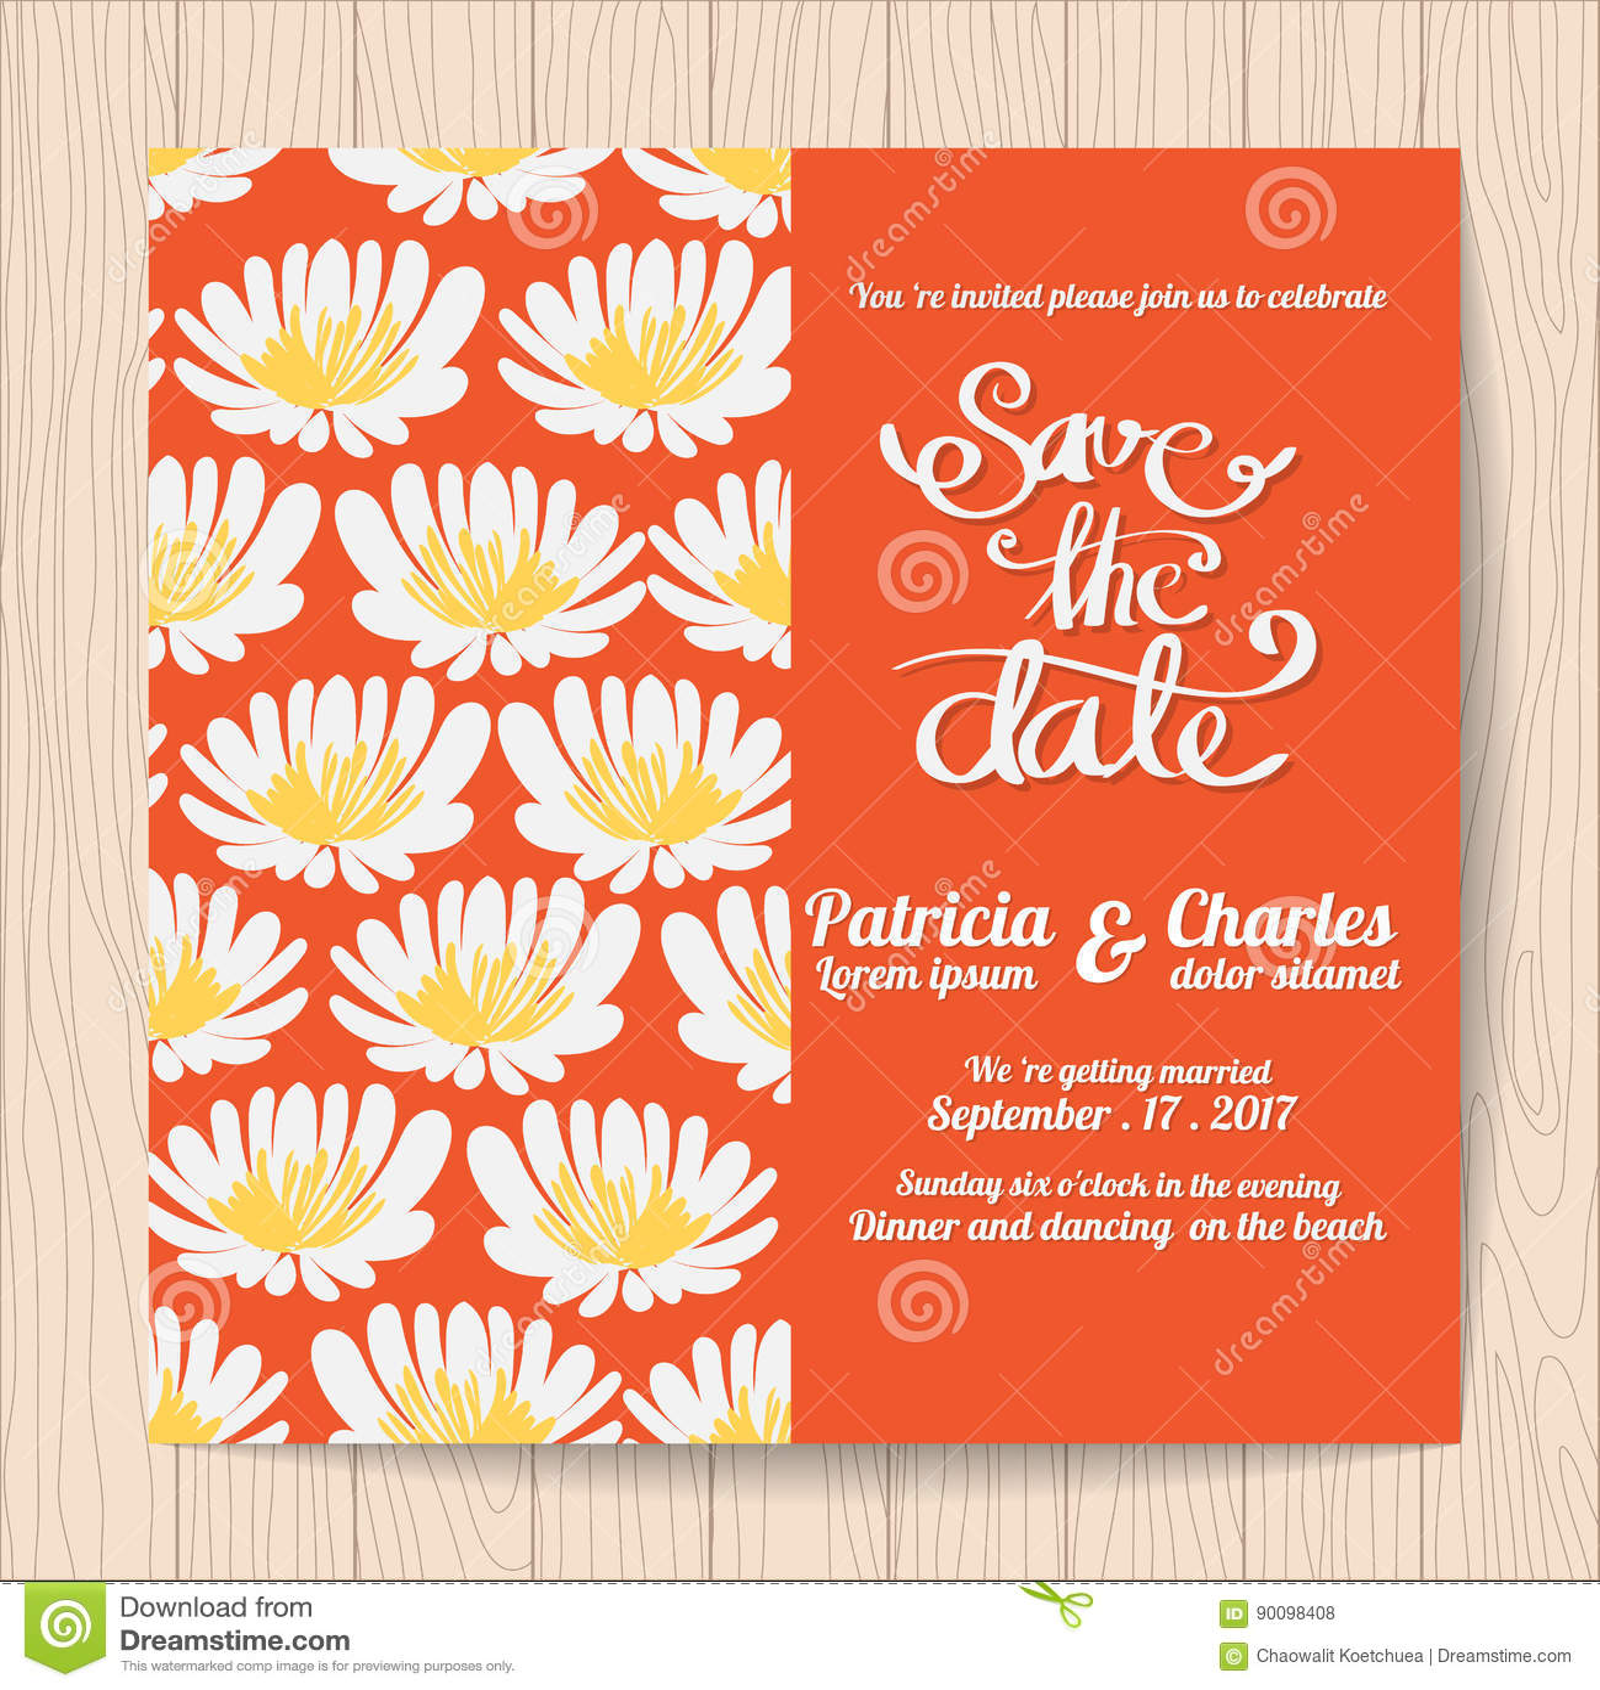 Wedding Invitation Card Templates Stock Vector - Illustration of ...